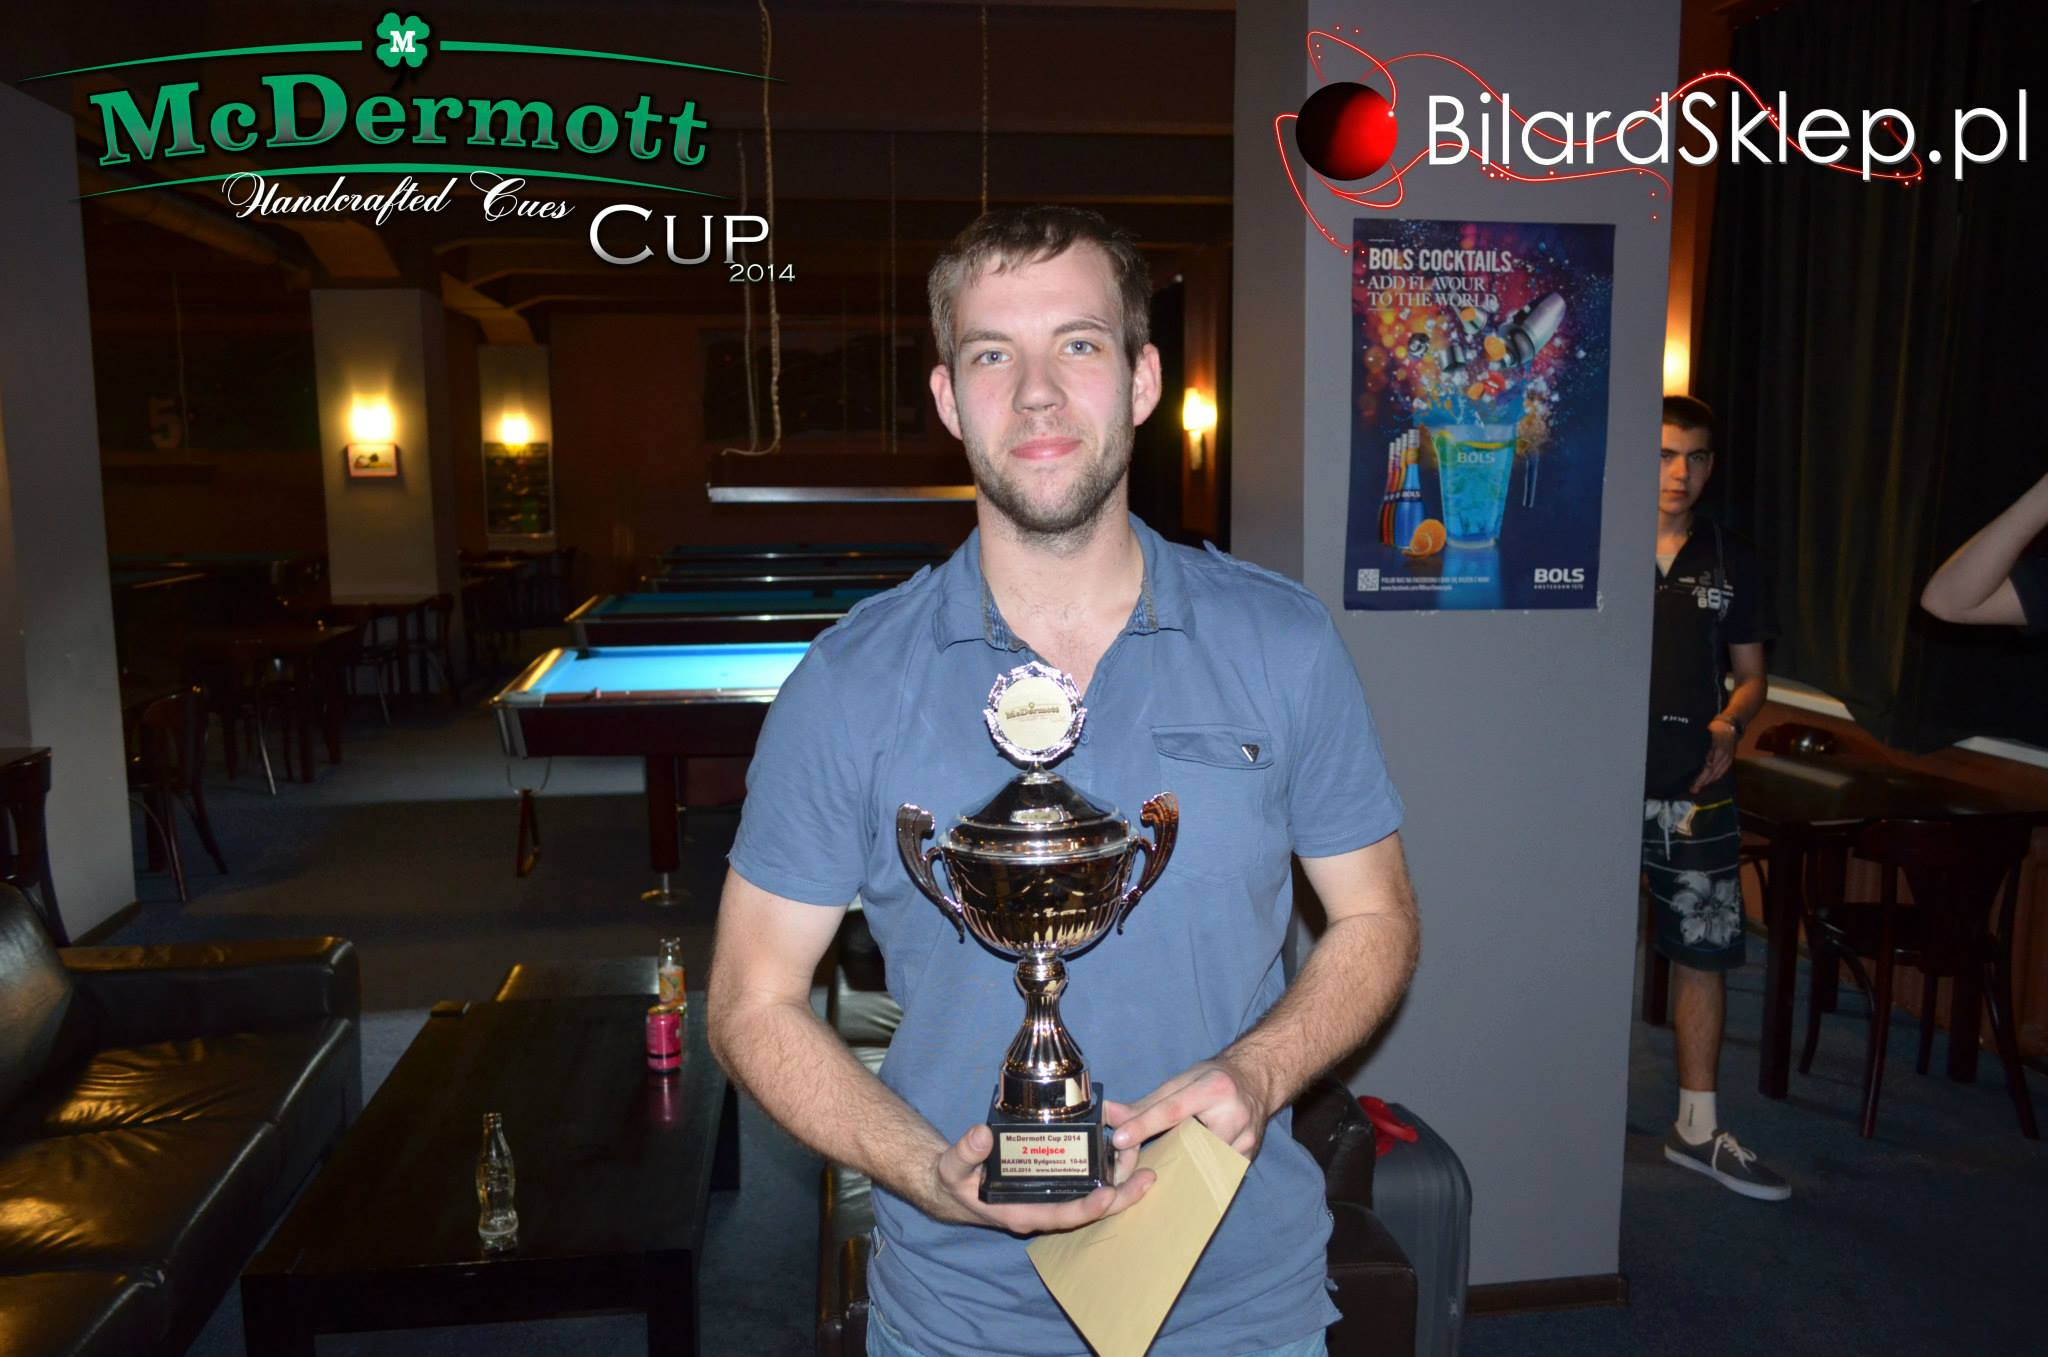 McDermott Cup 2014 Maximus Bydgoszcz | Igor Luliński